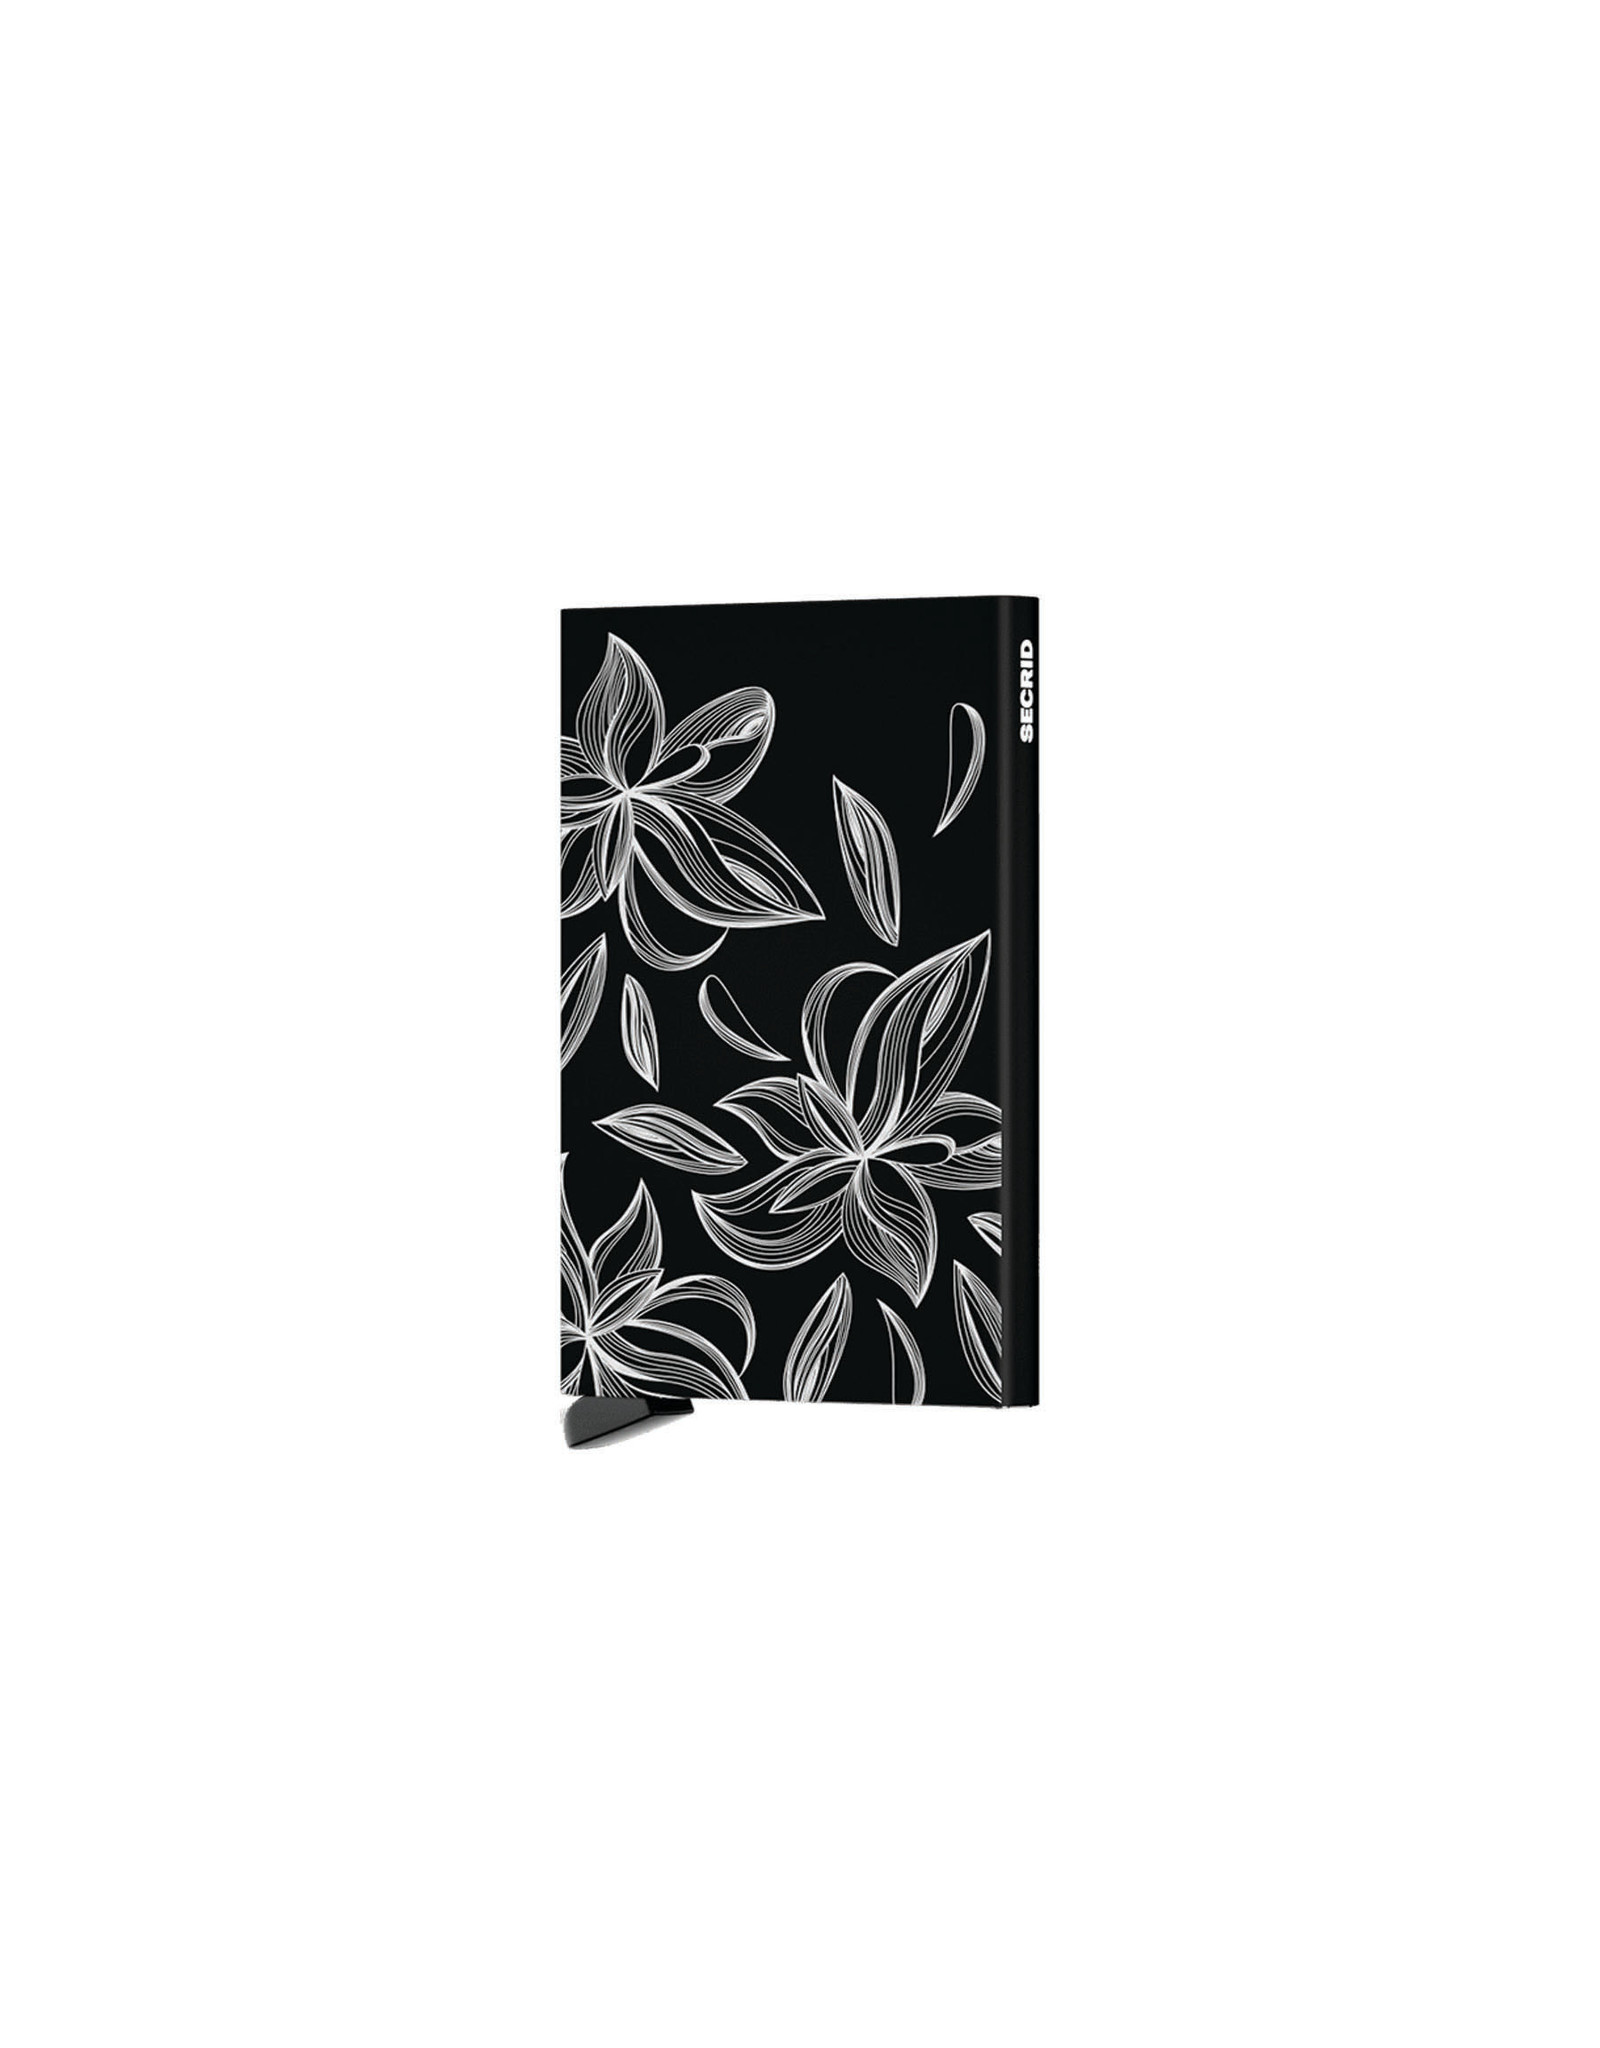 Secrid Cardprotector, Magnolia, Black